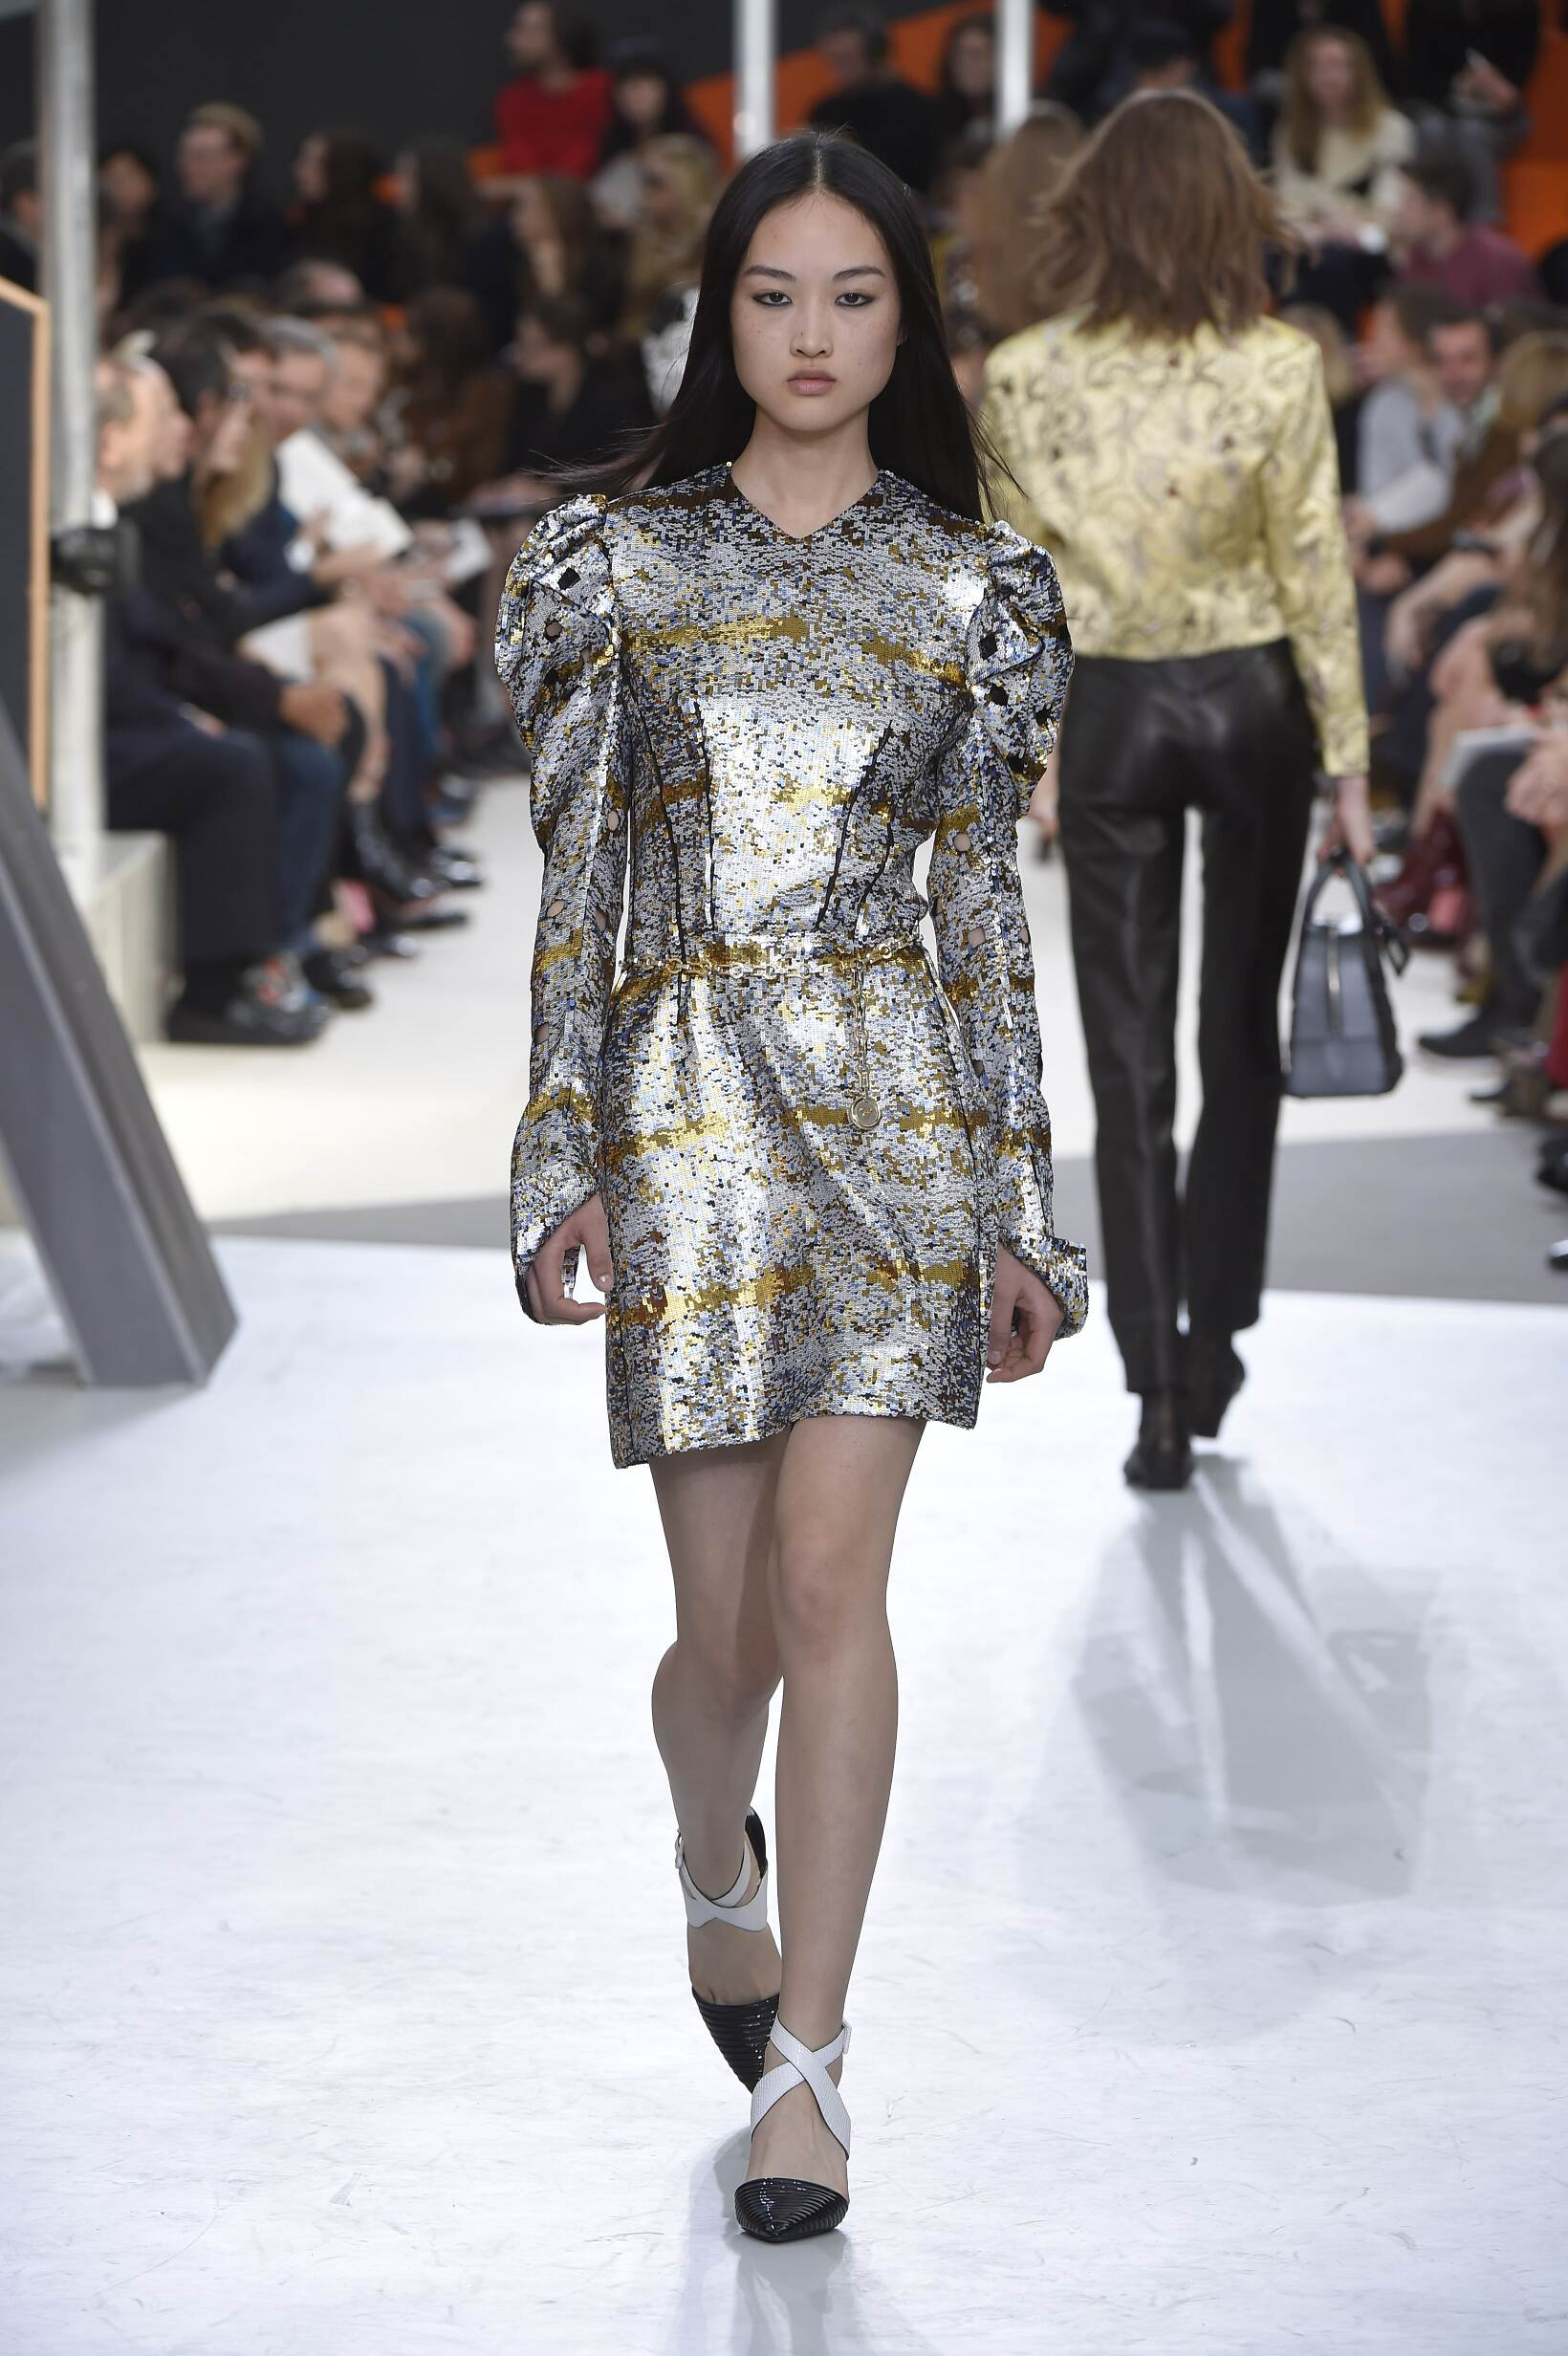 Fashion Show FW 2015 2016 Louis Vuitton Womenswear